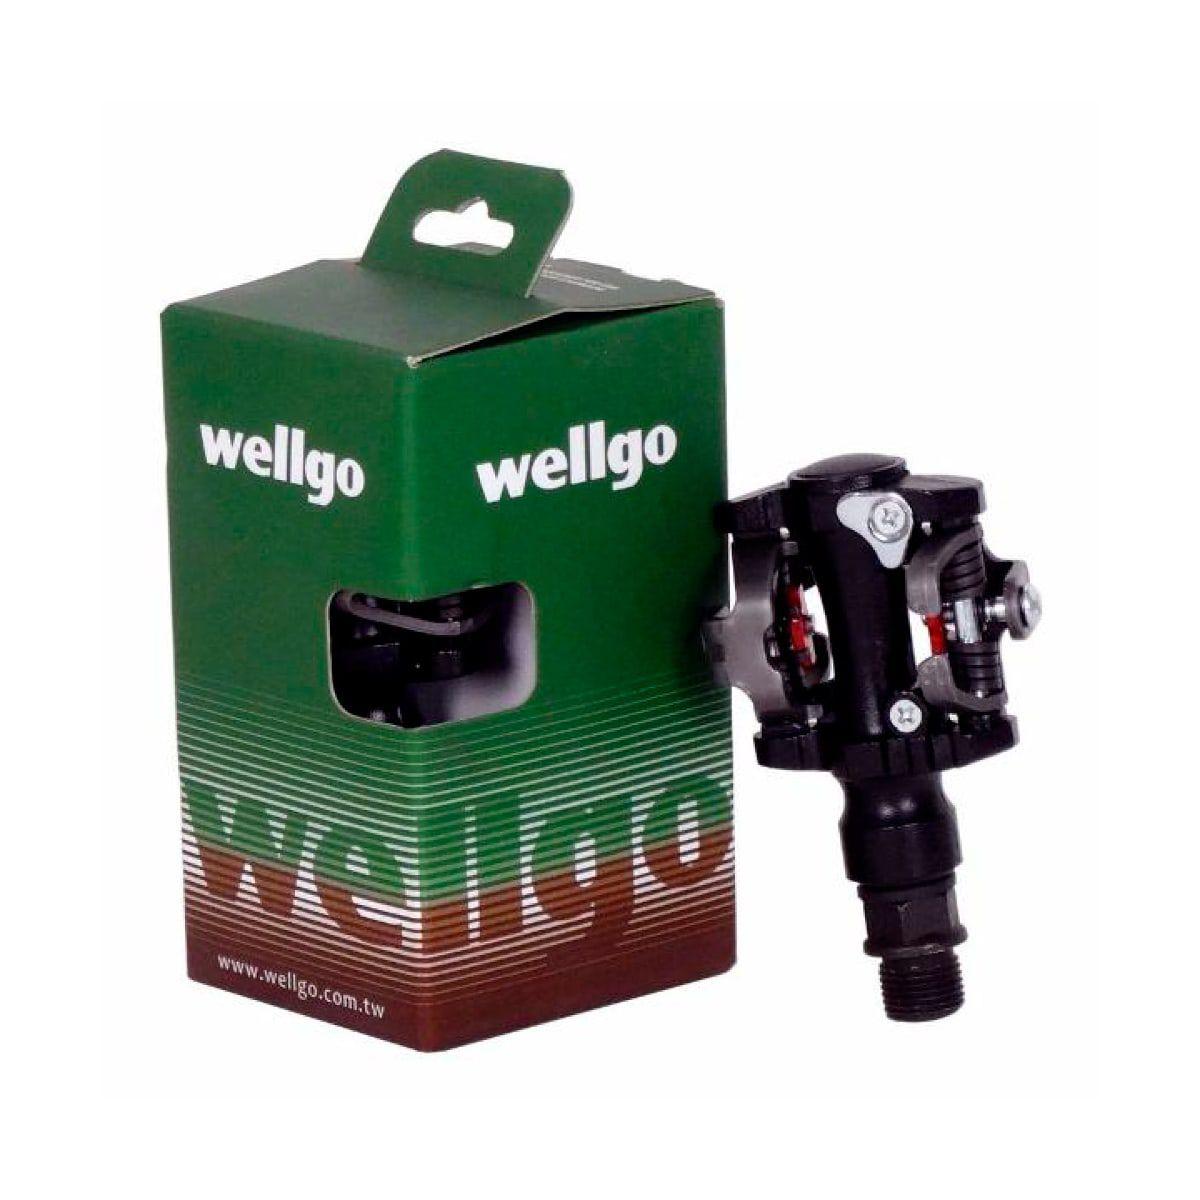 Pedal Wellgo Clip M919 Preto C/ Taquinho mtb